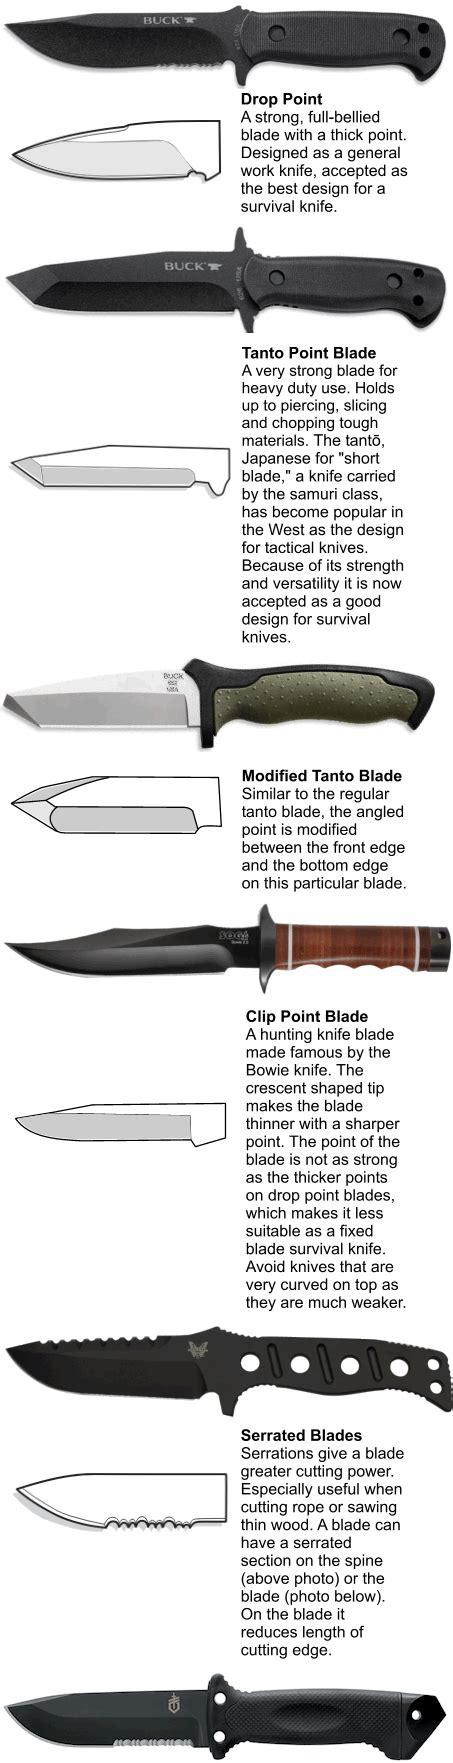 knife blade designs choosing a survival knife